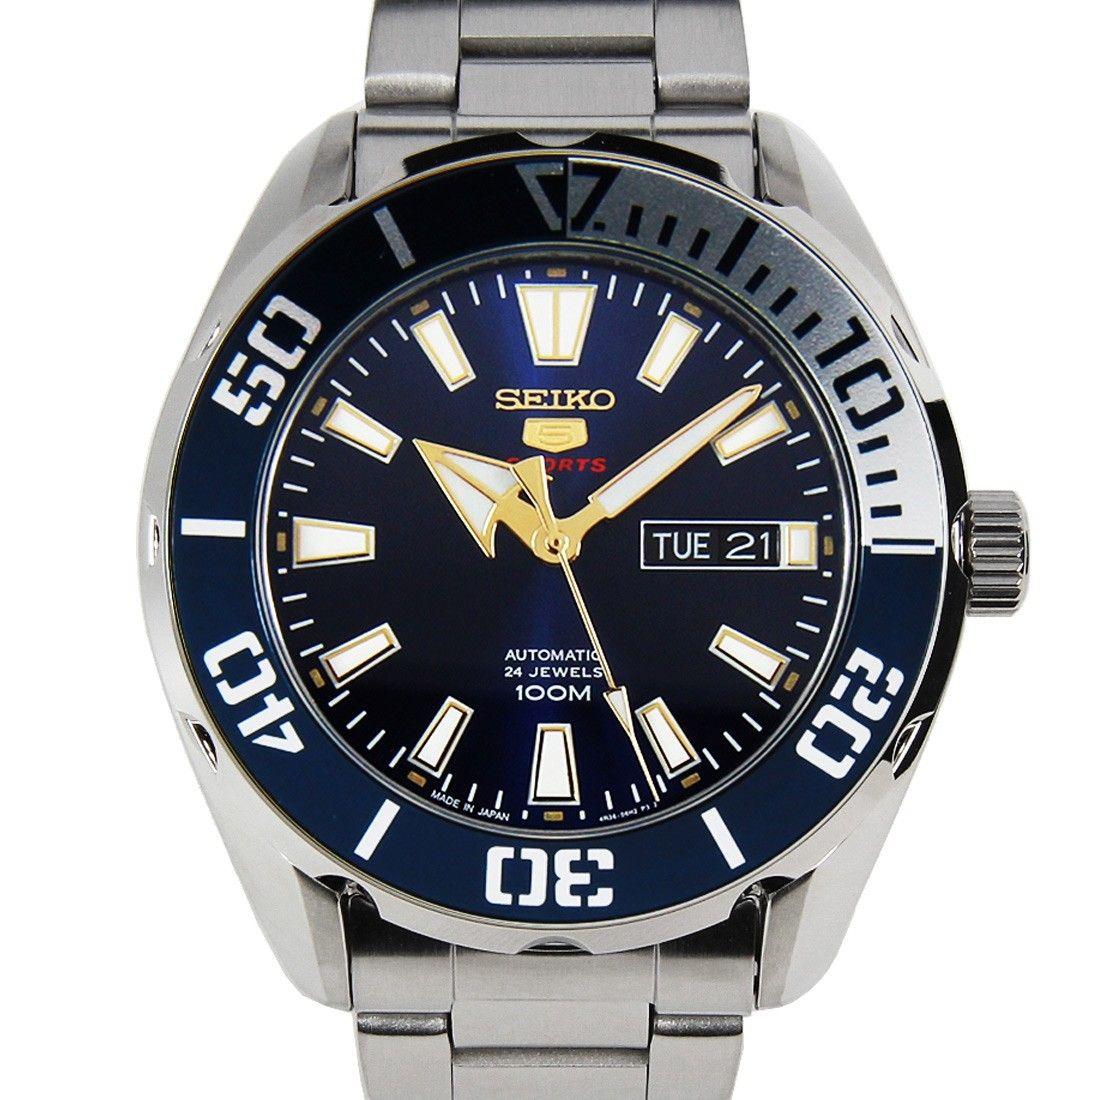 Seiko 5 Sports Automatic Watch SRPC51 SRPC51J1 Seiko 5